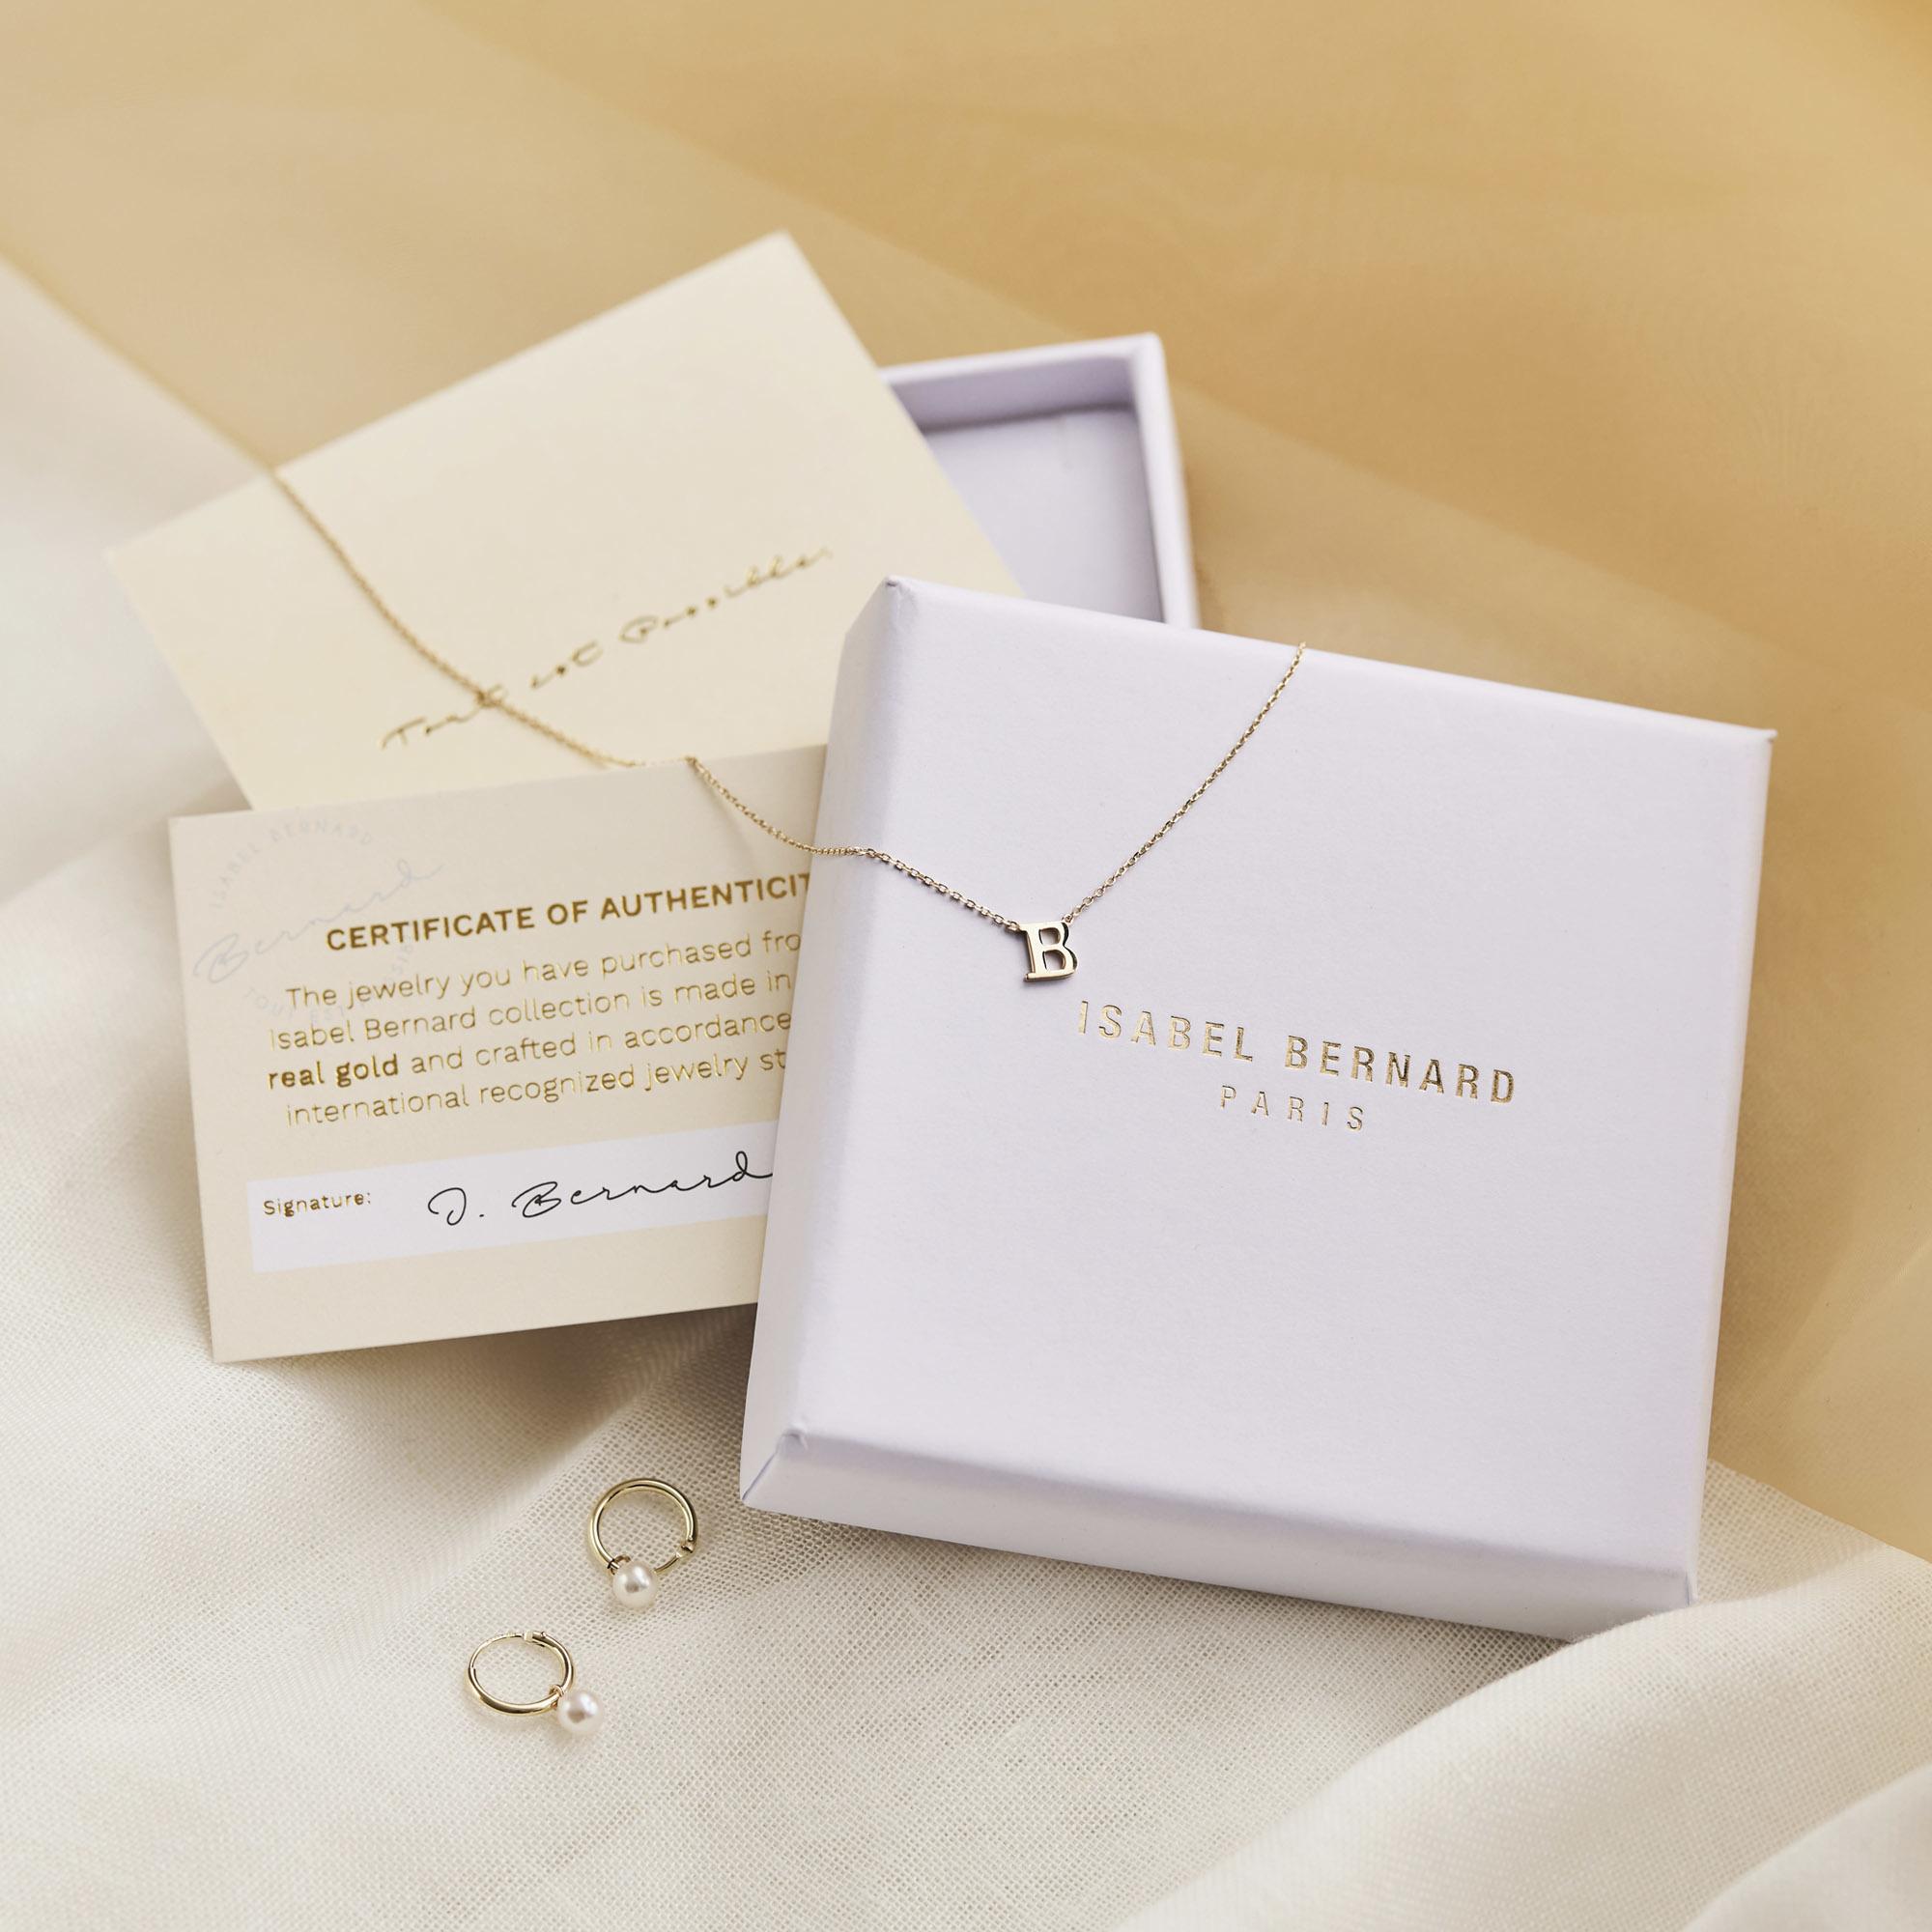 Isabel Bernard Saint Germain Chloé collier initiale en or blanc 14 carats